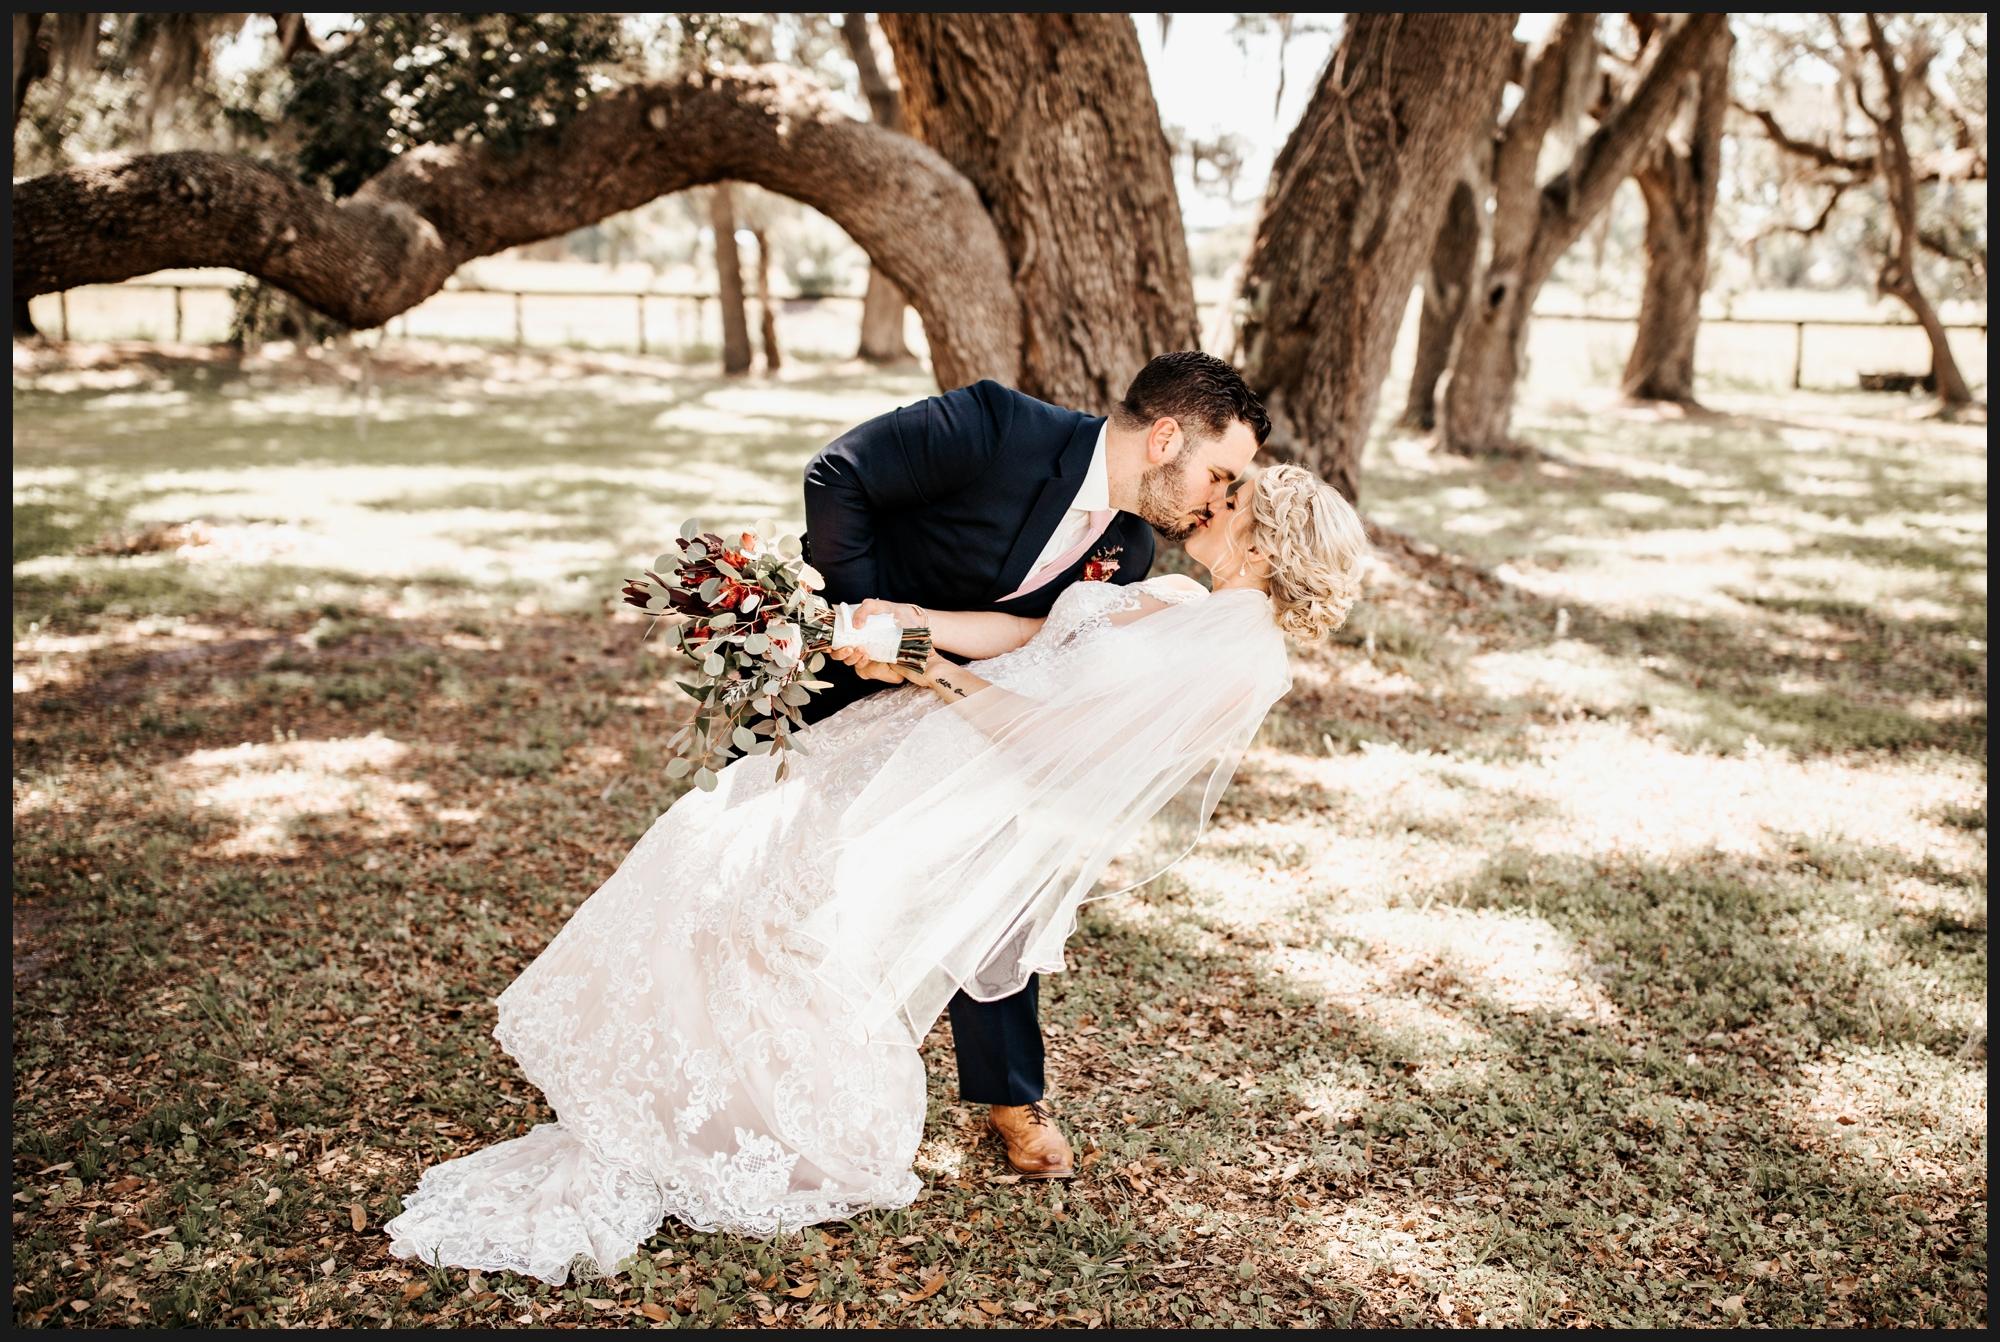 Orlando-Wedding-Photographer-destination-wedding-photographer-florida-wedding-photographer-hawaii-wedding-photographer_0580.jpg